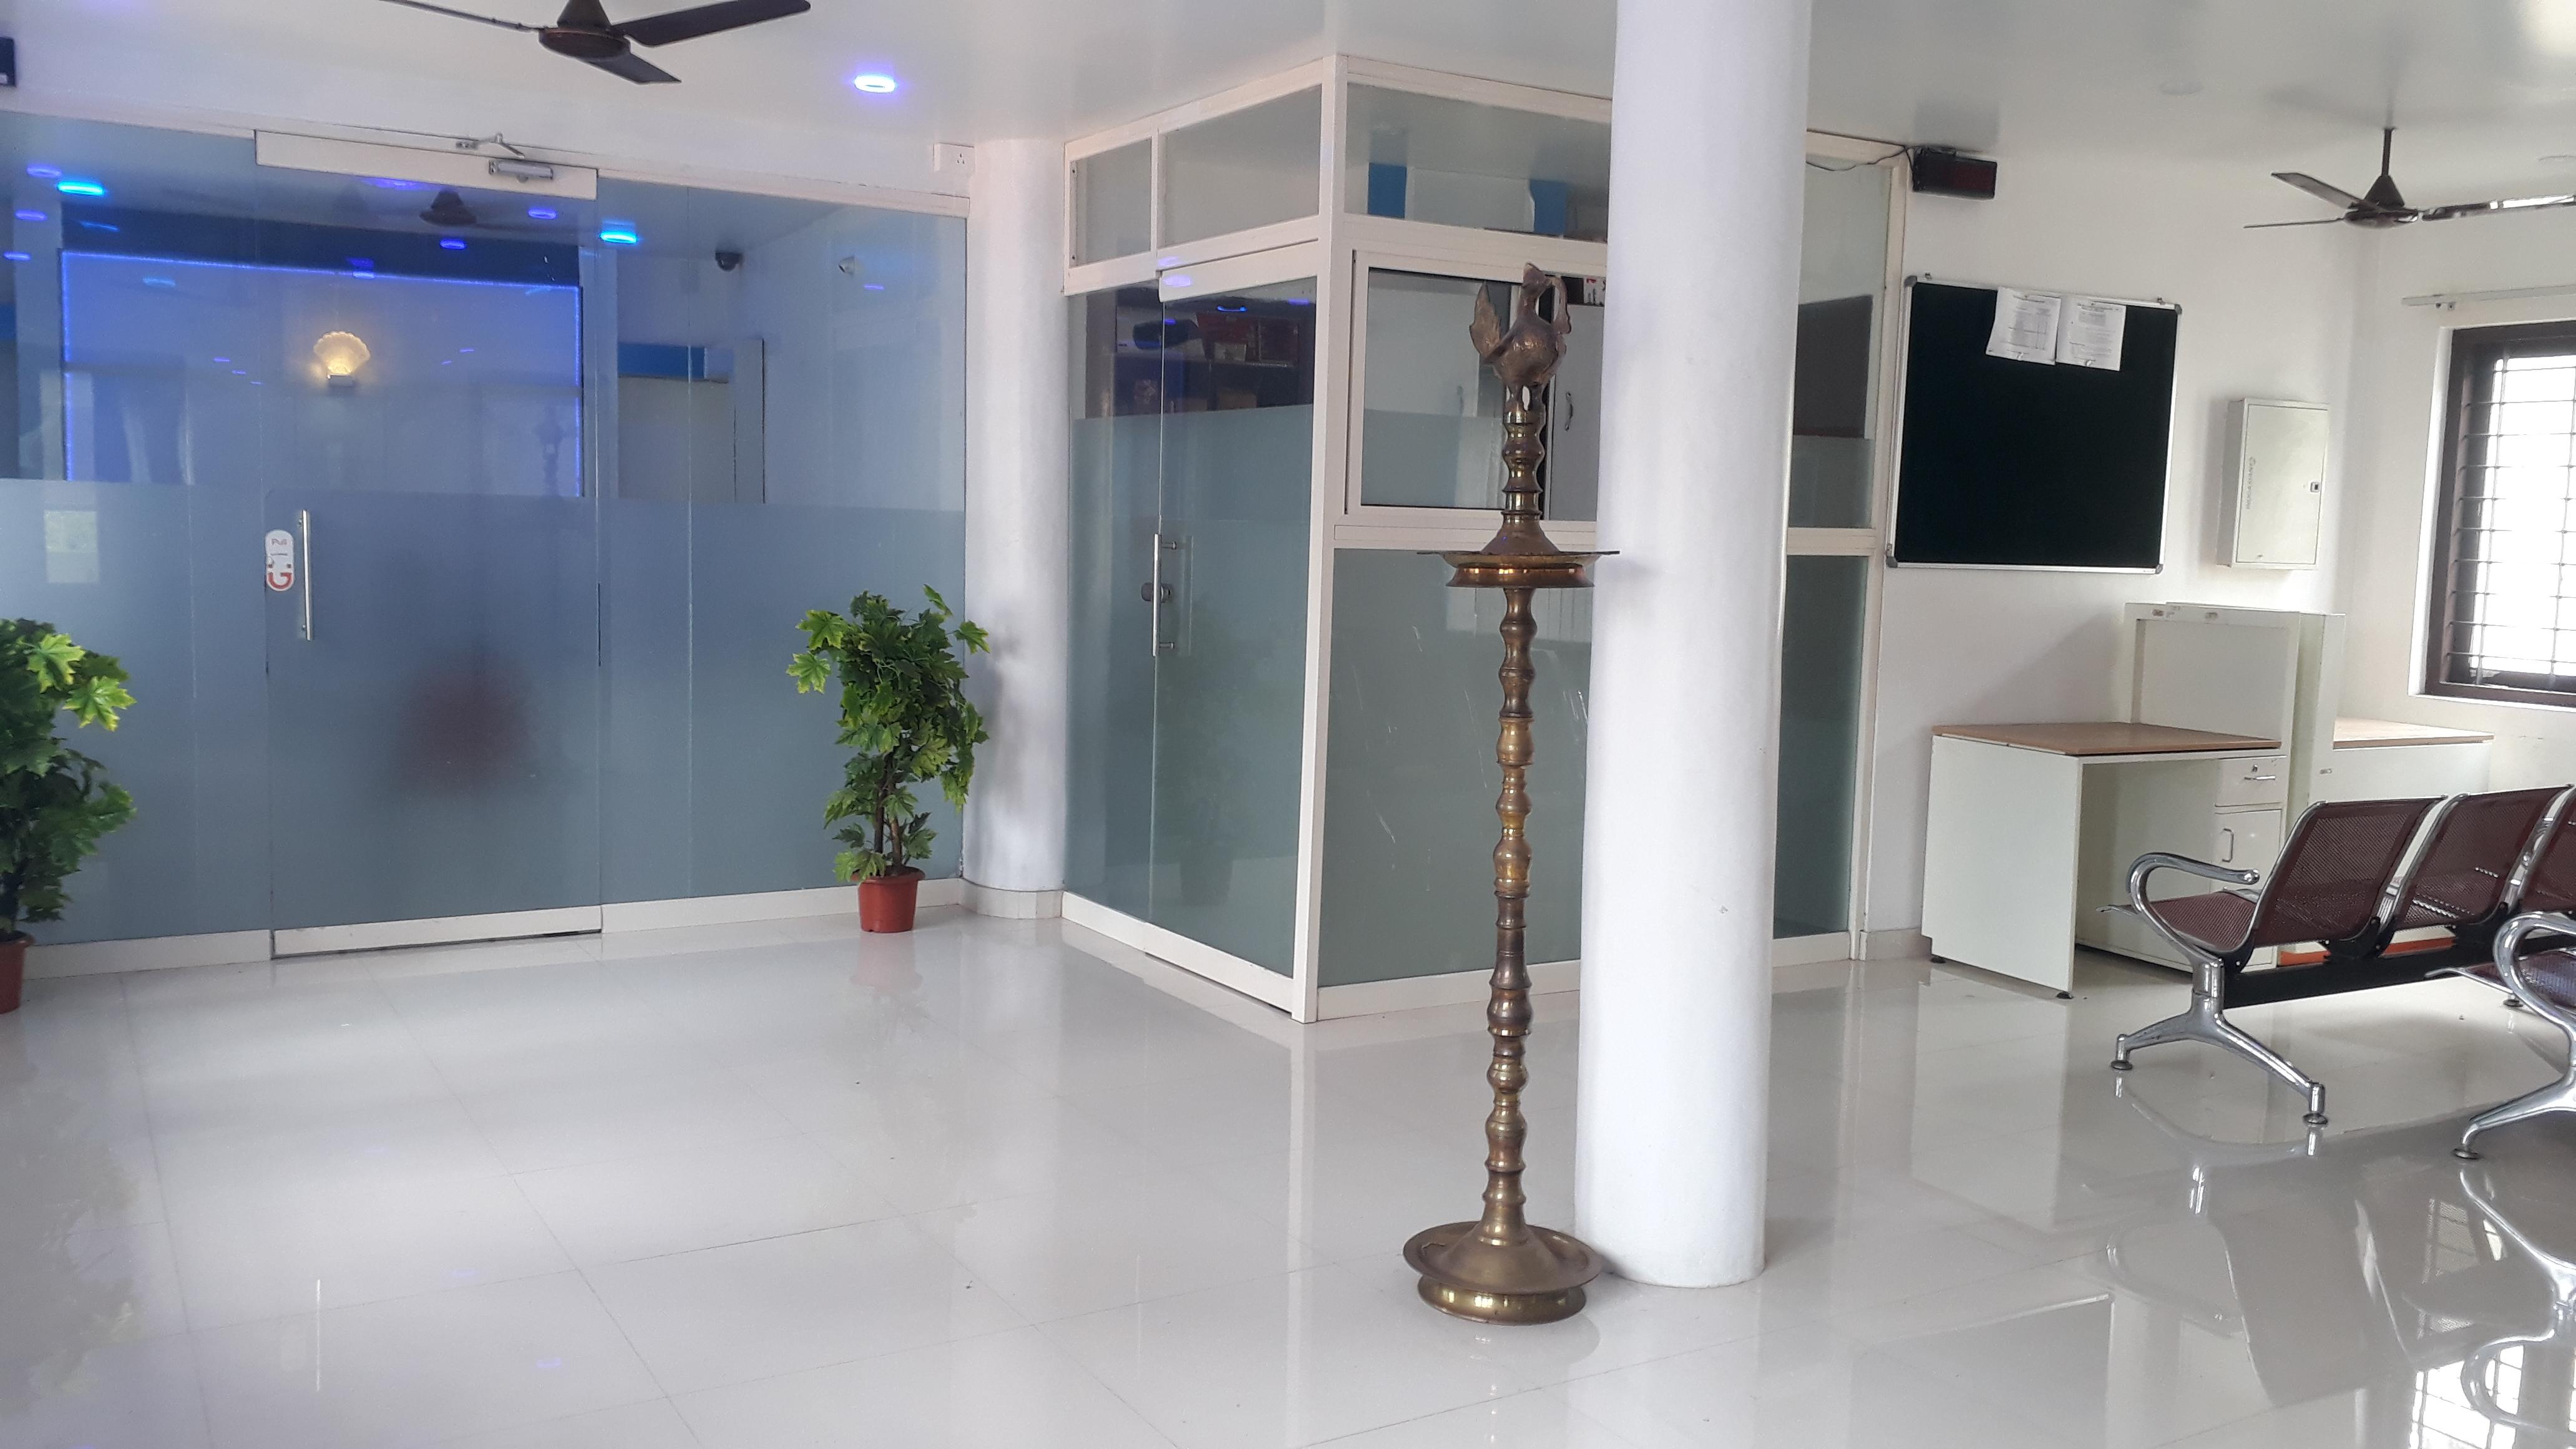 Ascent technologies in Thiruvananthapuram